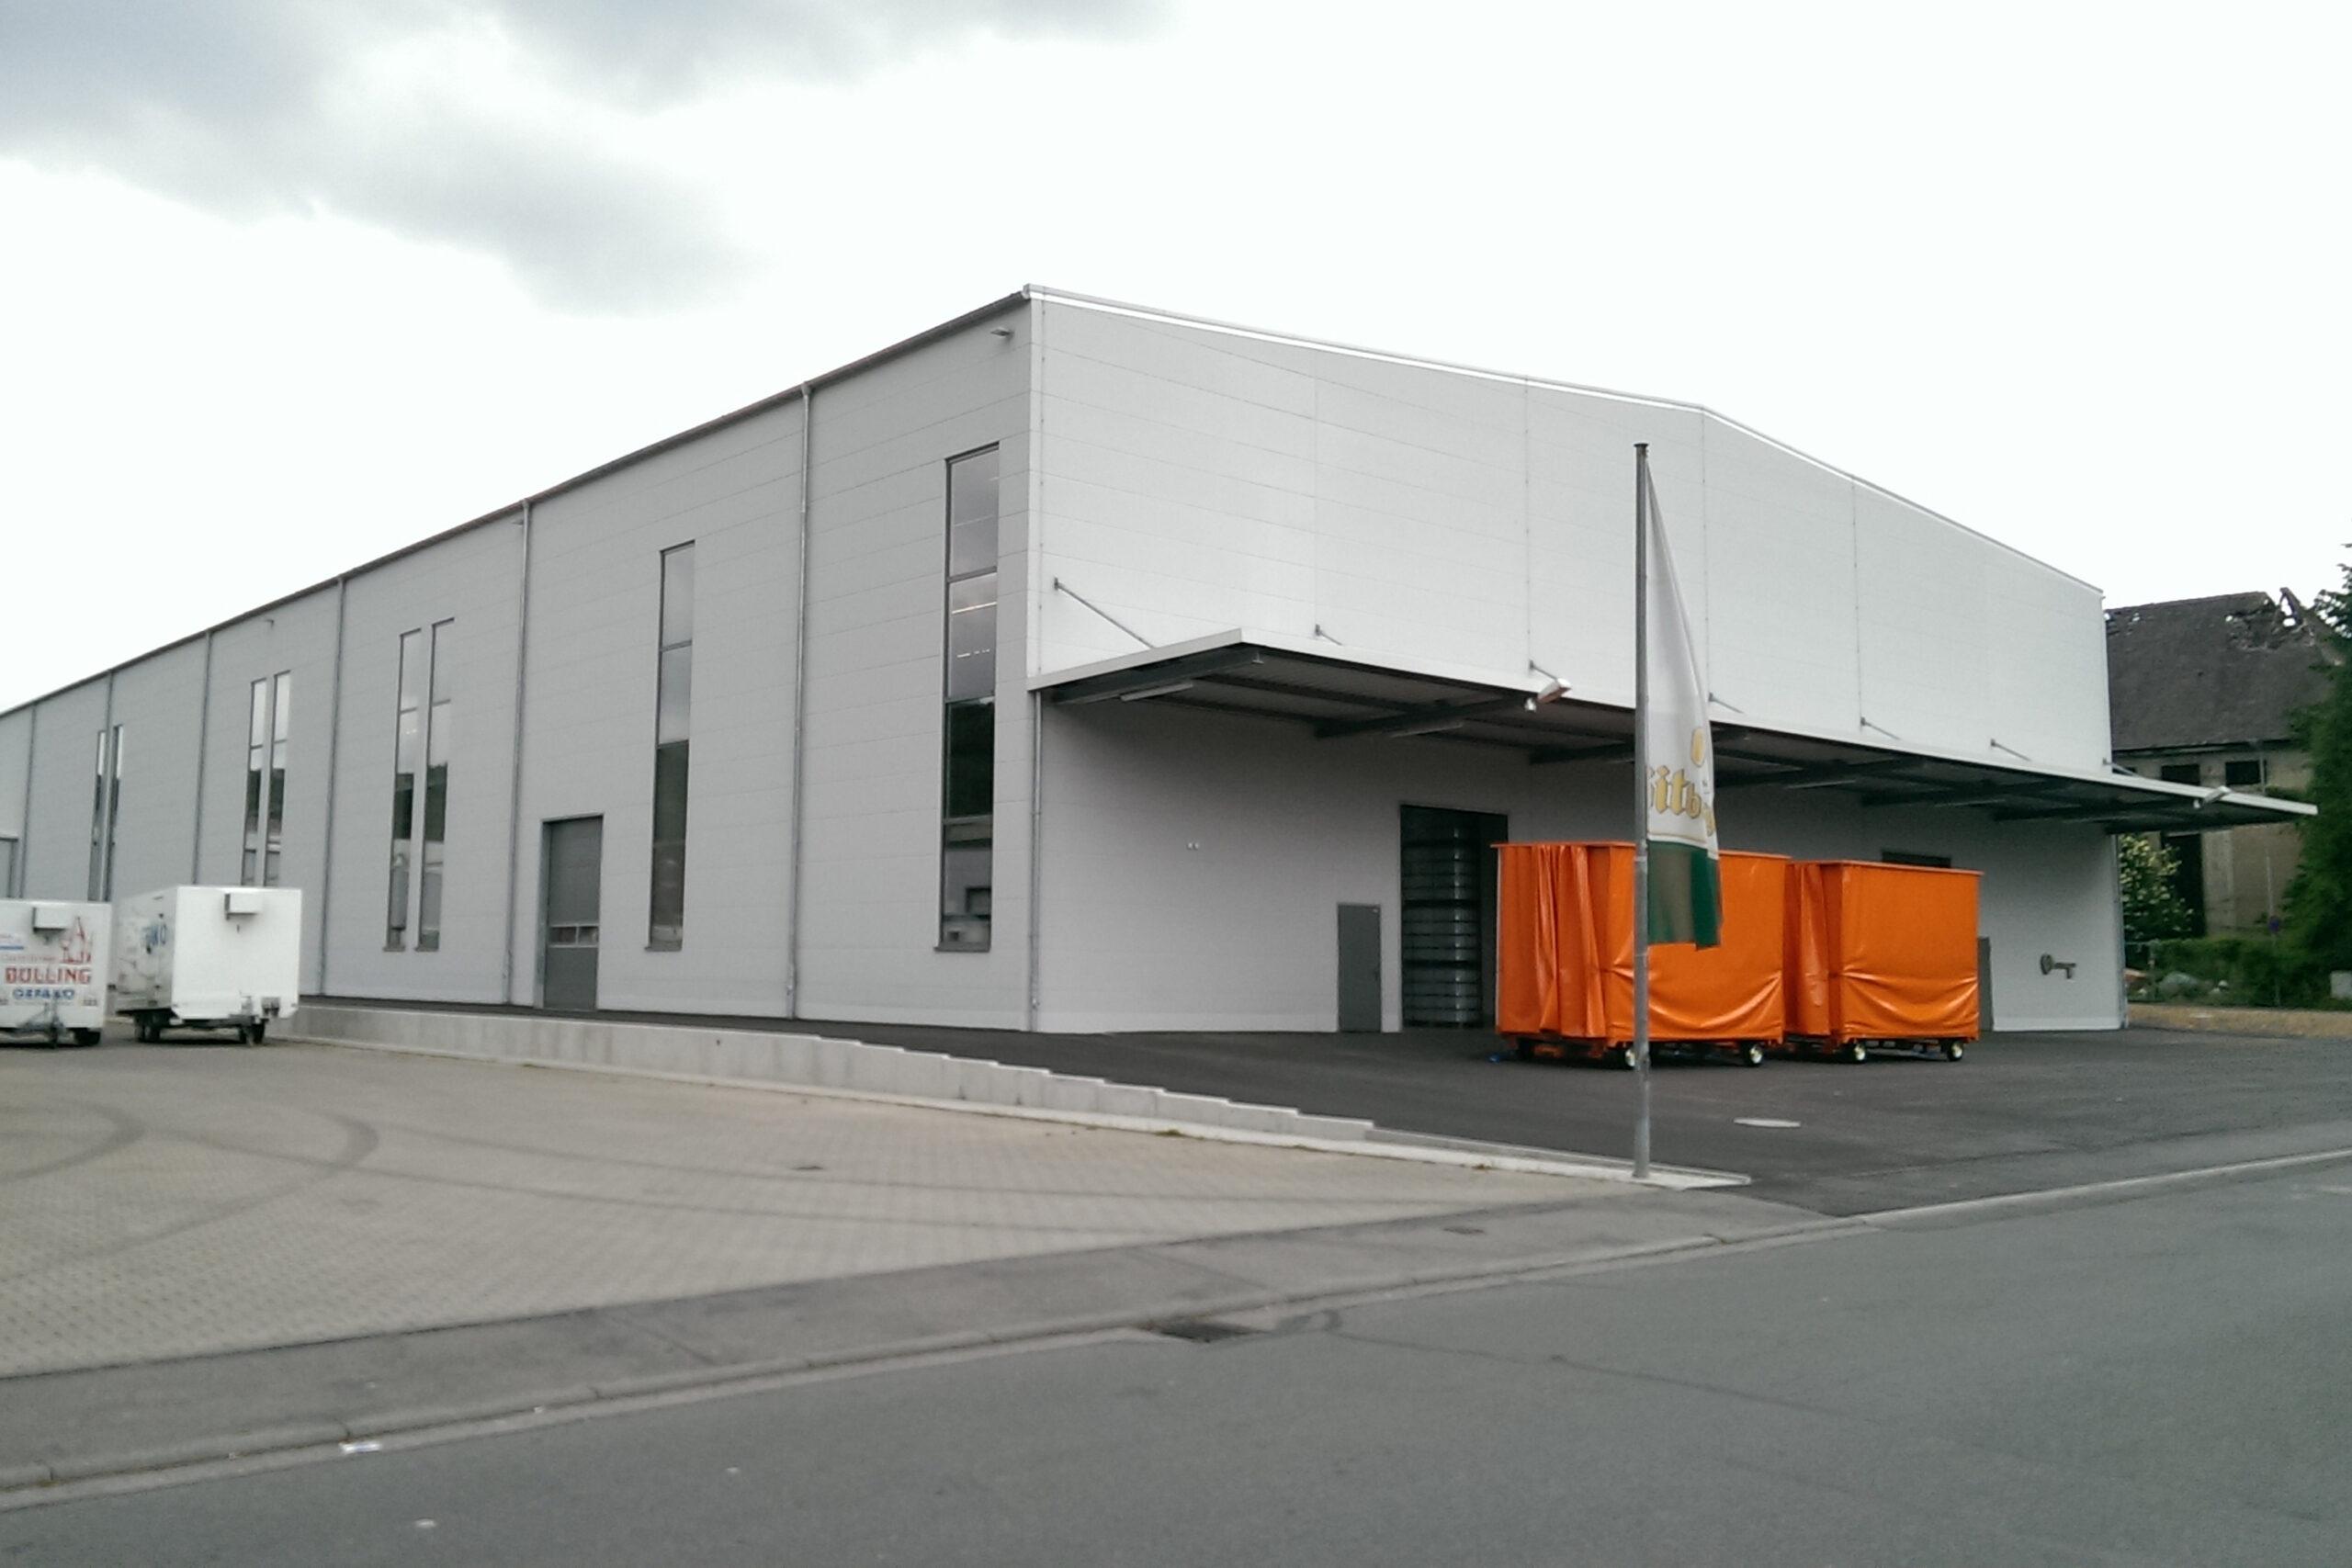 Neubau eines Rohwarenlagers